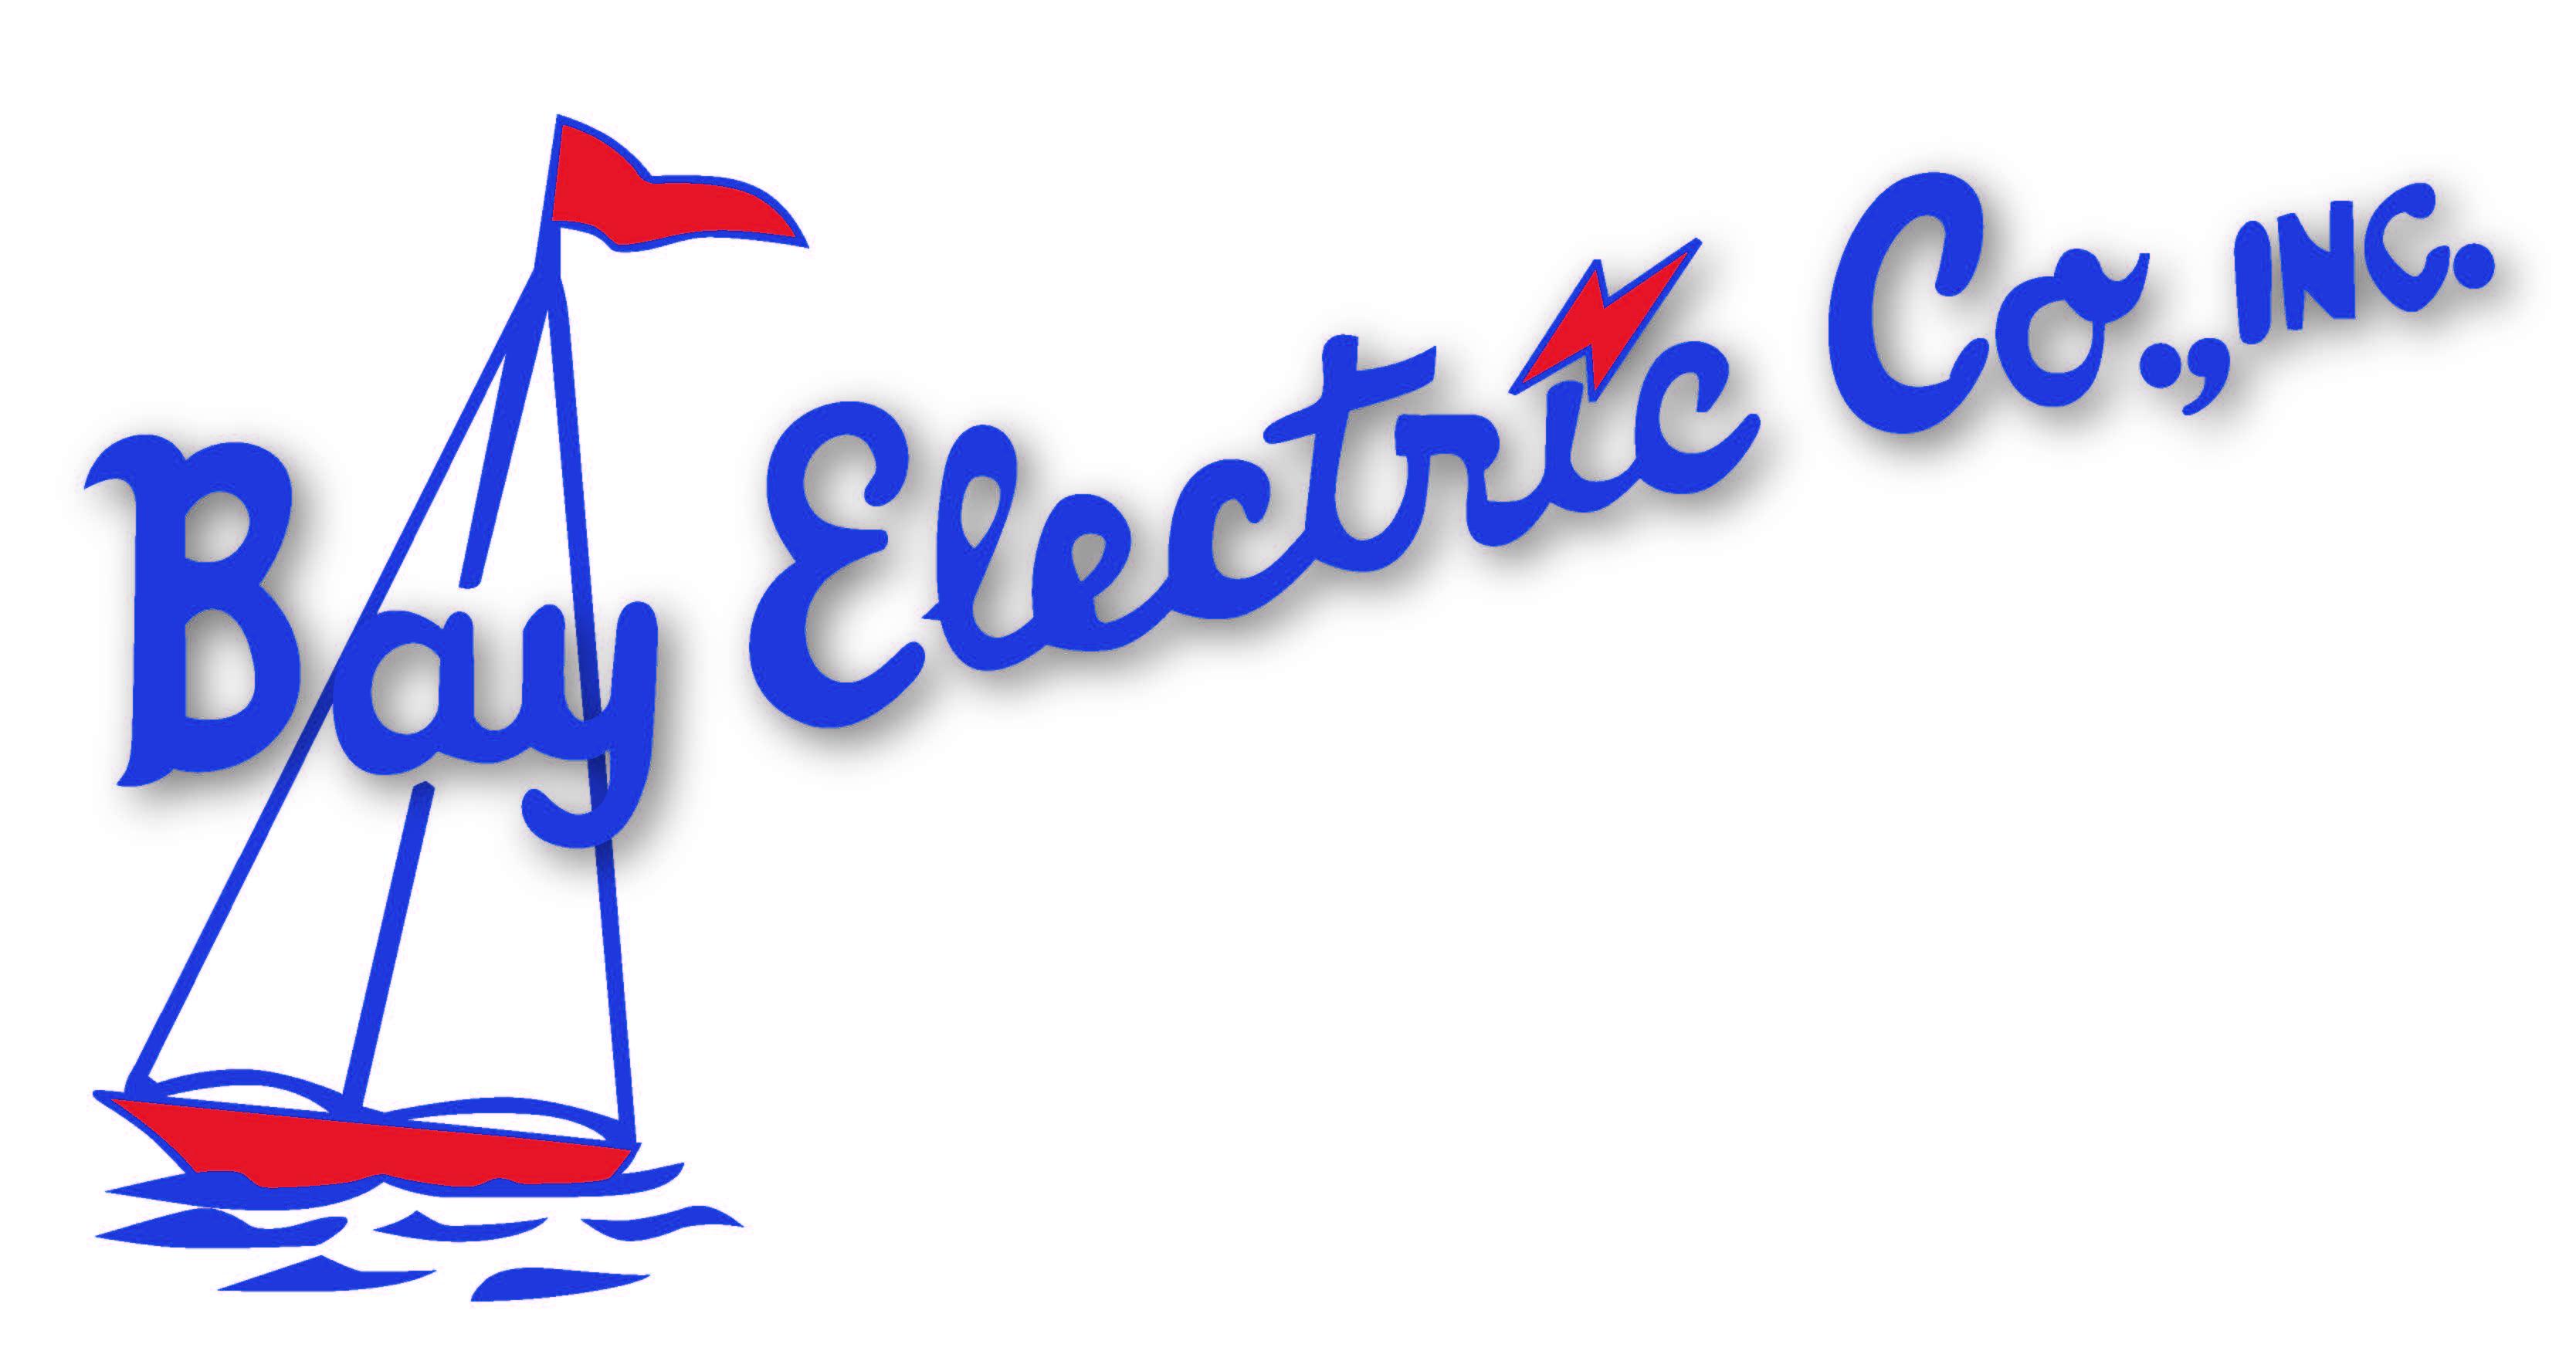 Bay Electric Company